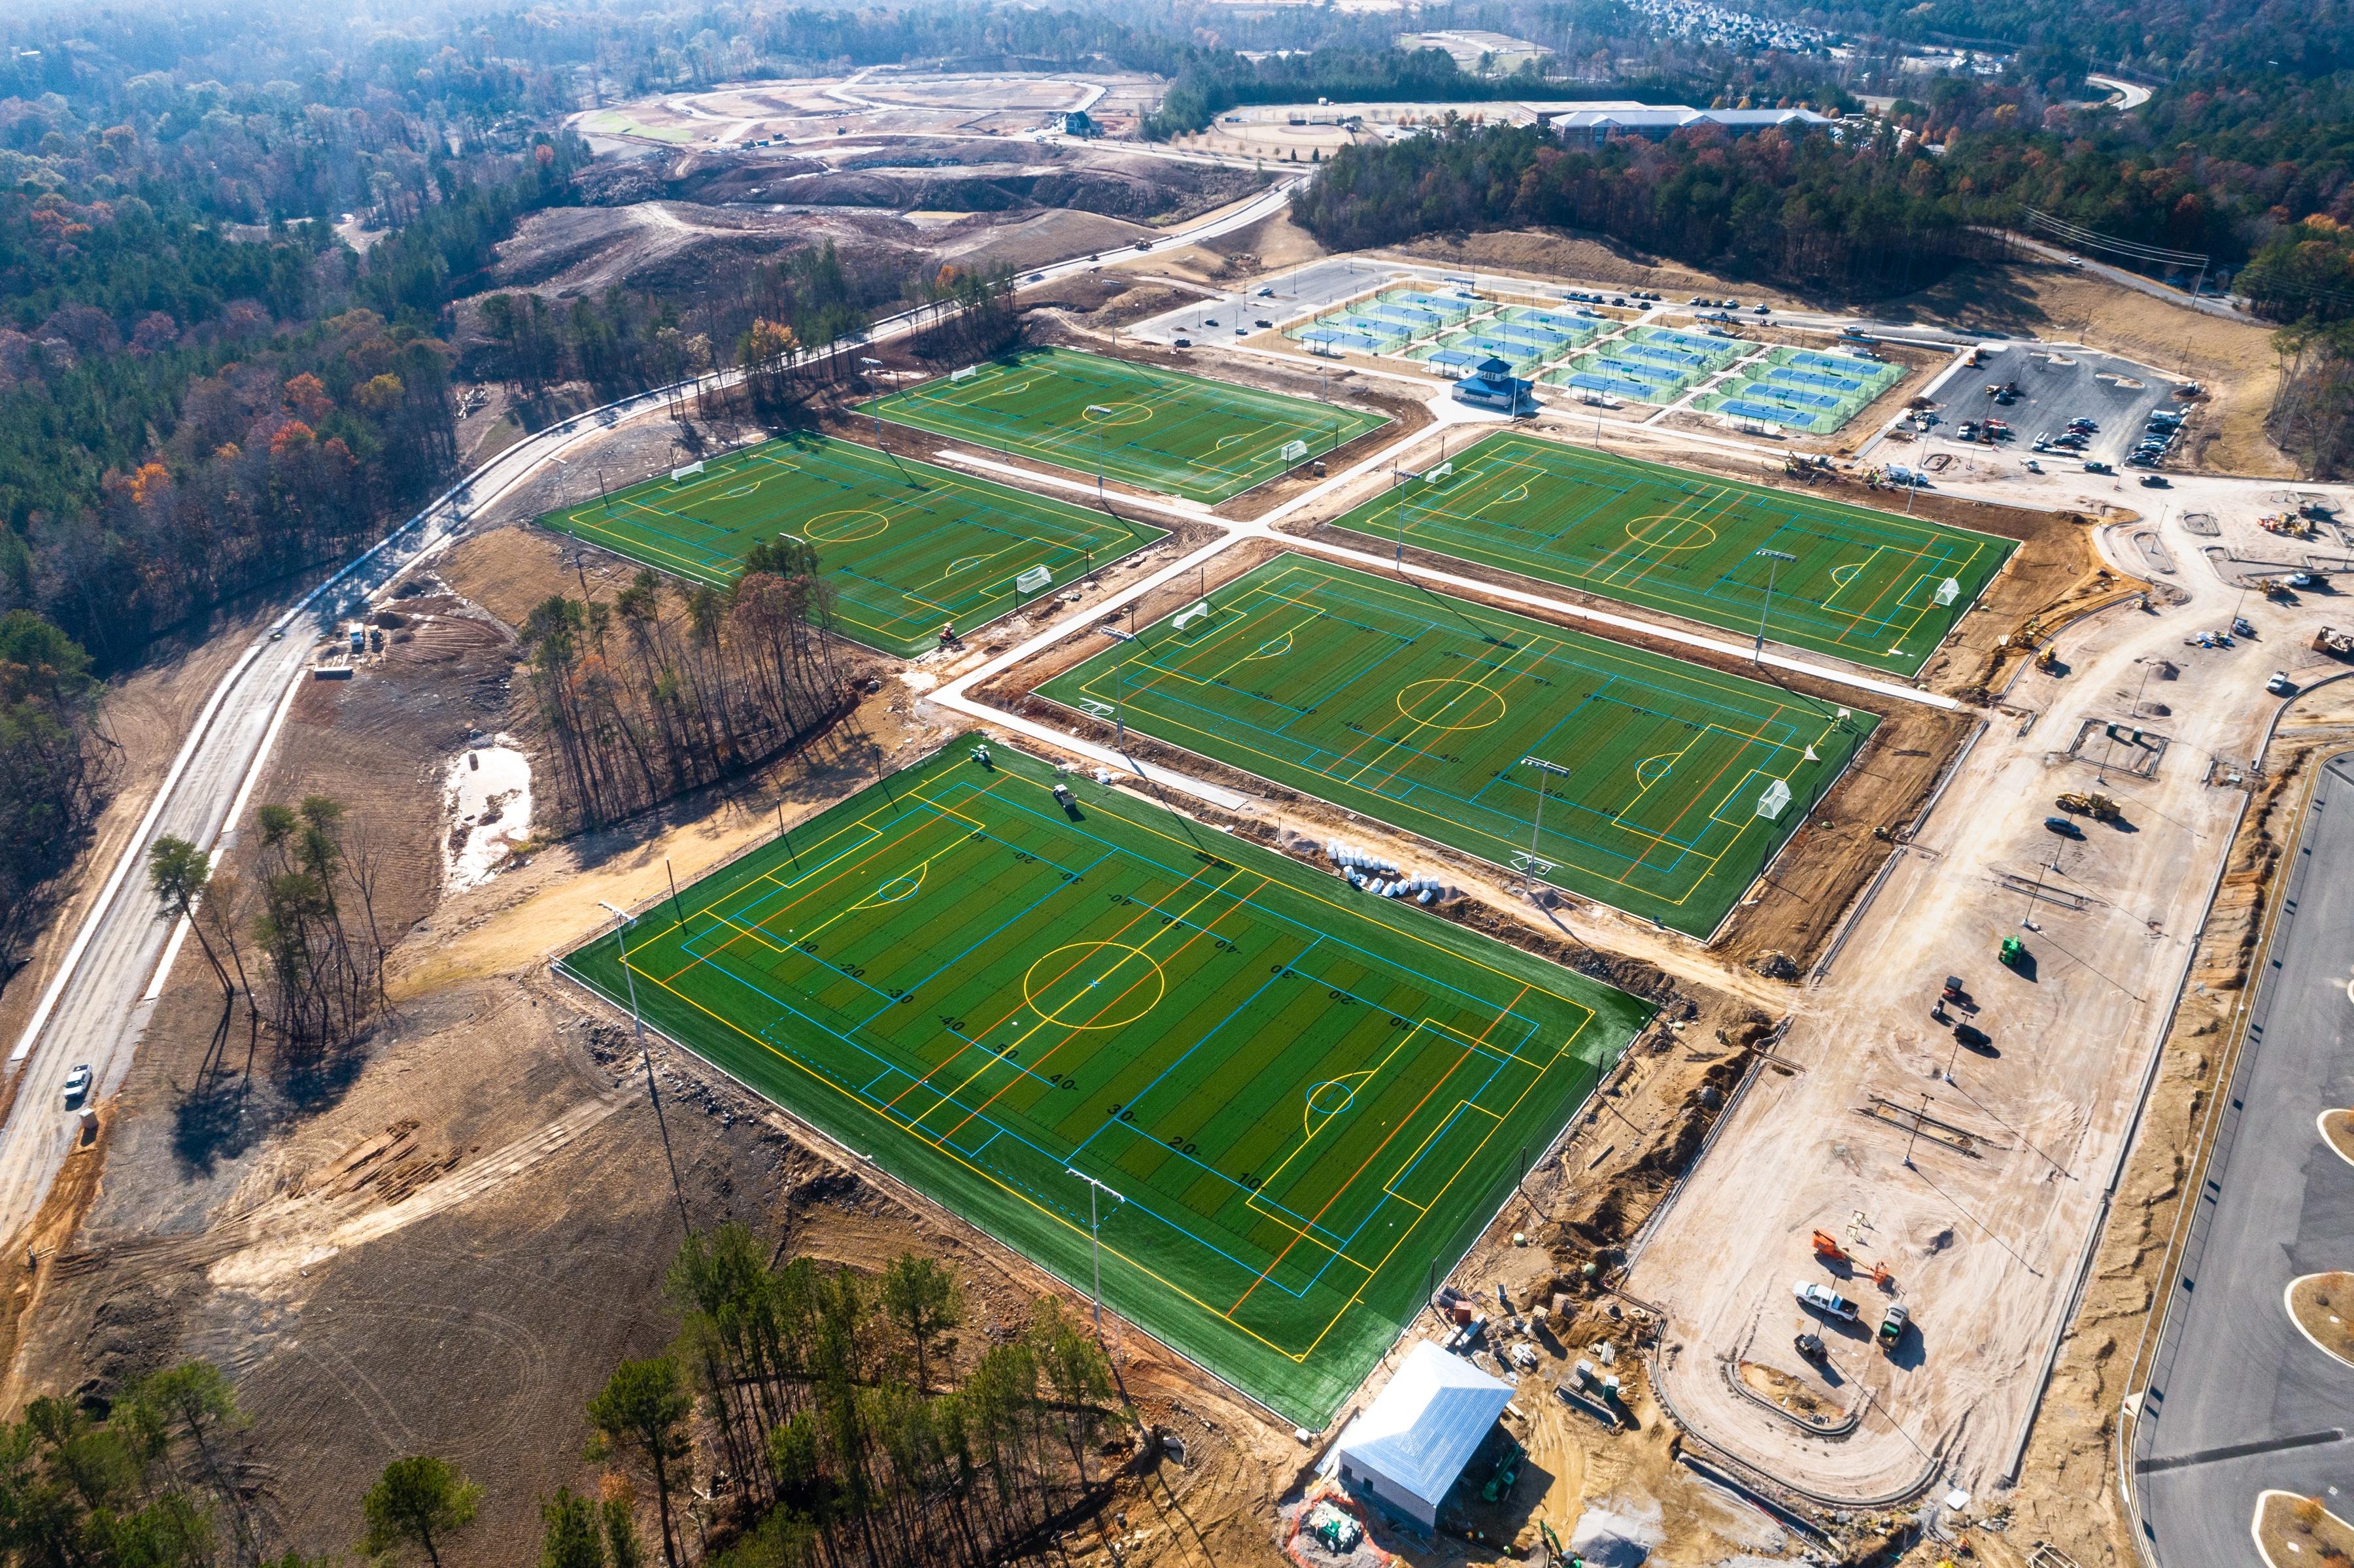 Alabama, Synthetic Turf, Artificial Turf, baseball field, multipurpose field, tennis